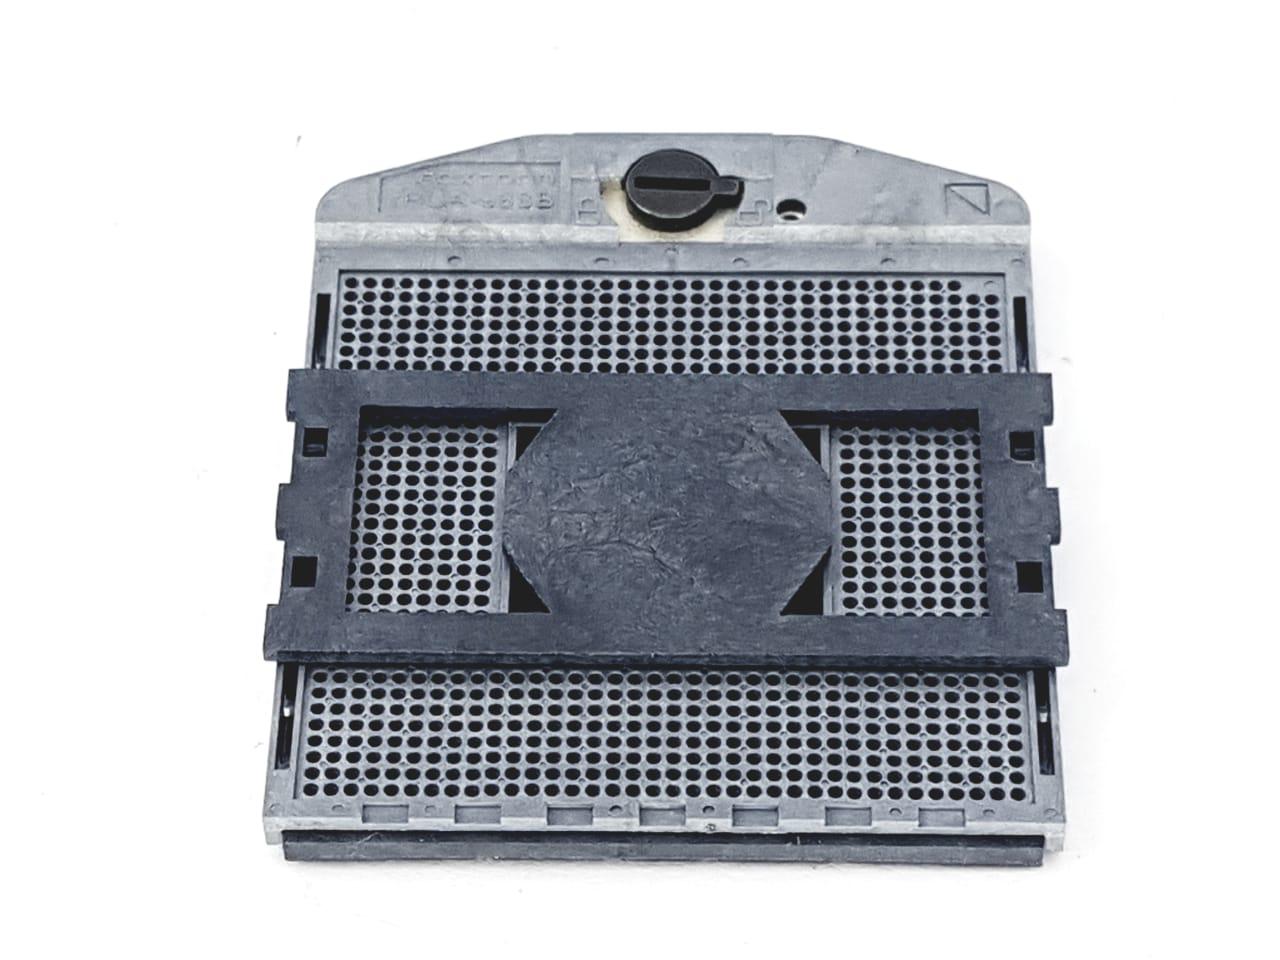 Soquete para notebook APGA - 988 B APGA988B Foxcon